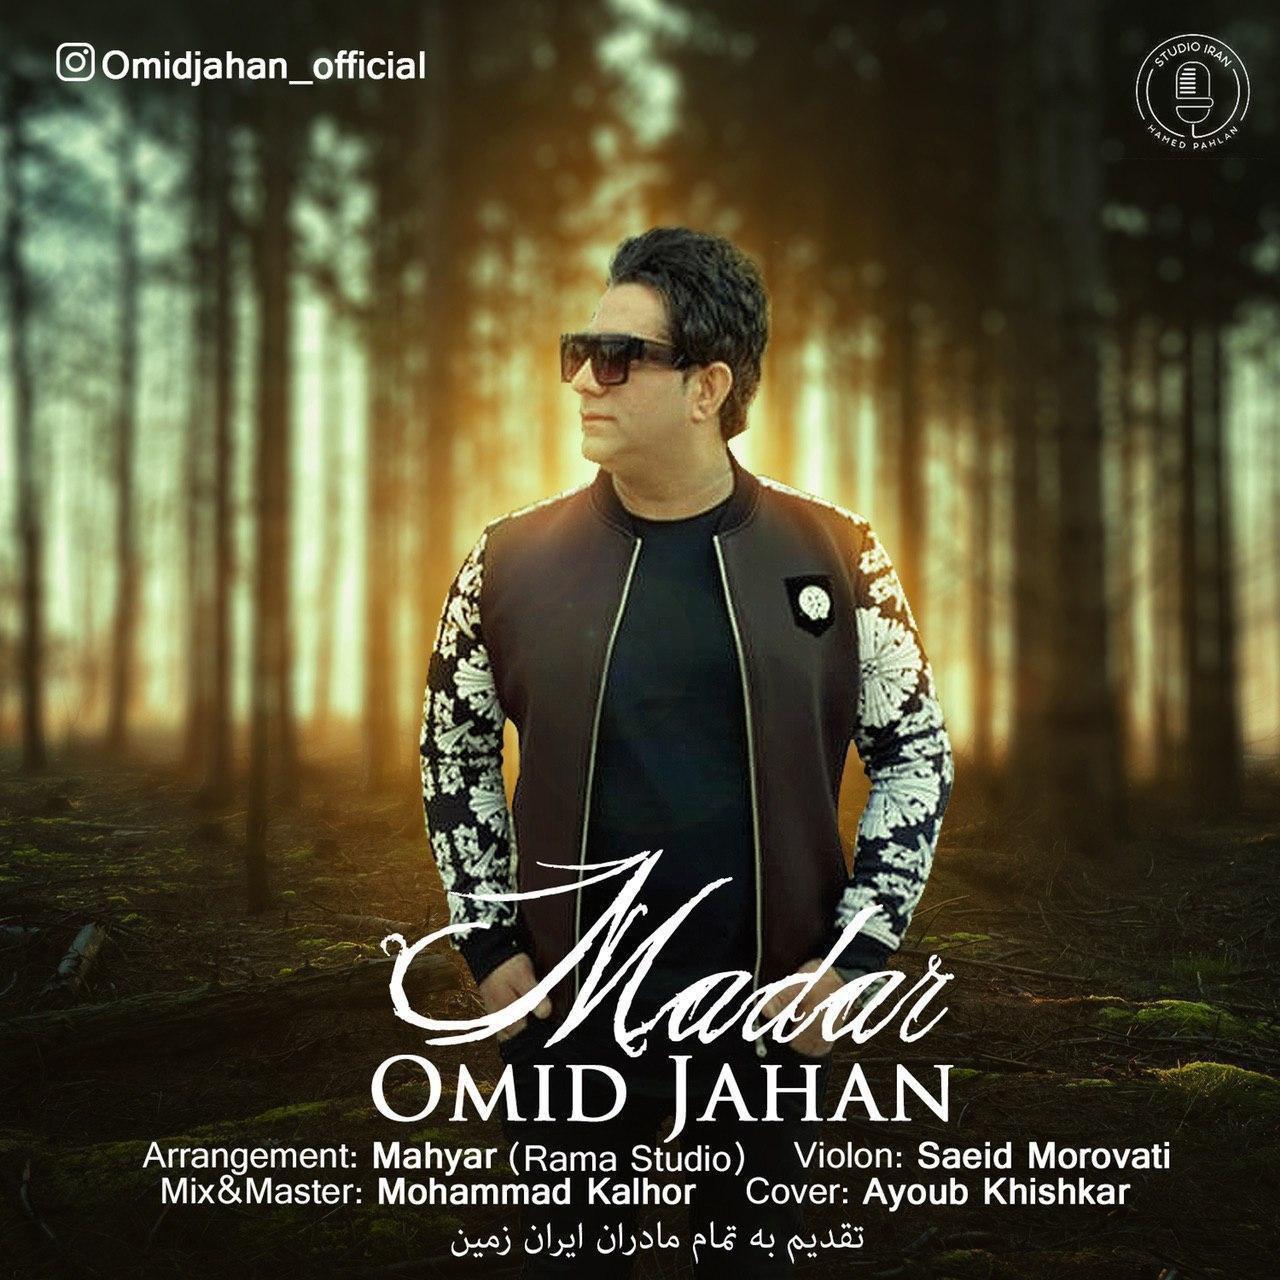 Omid Jahan - Madar  - دانلود آهنگ امید جهان به نام مادر